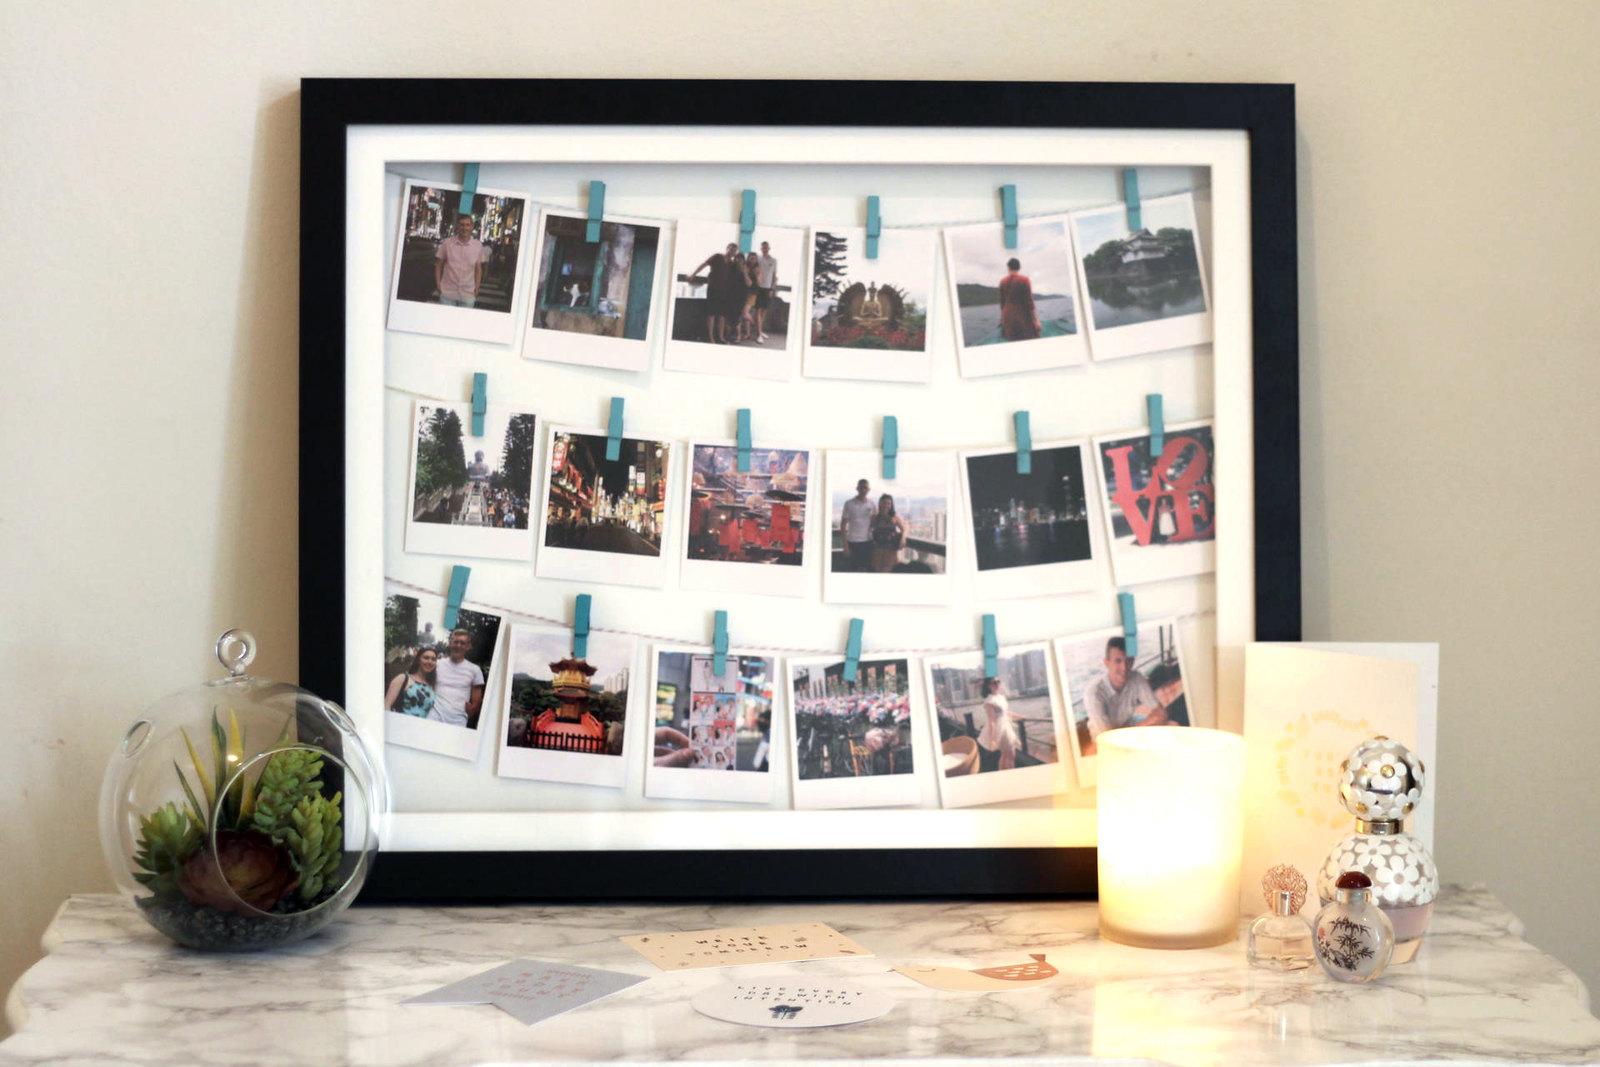 DIY Instagram Clothes Line Photo Frame